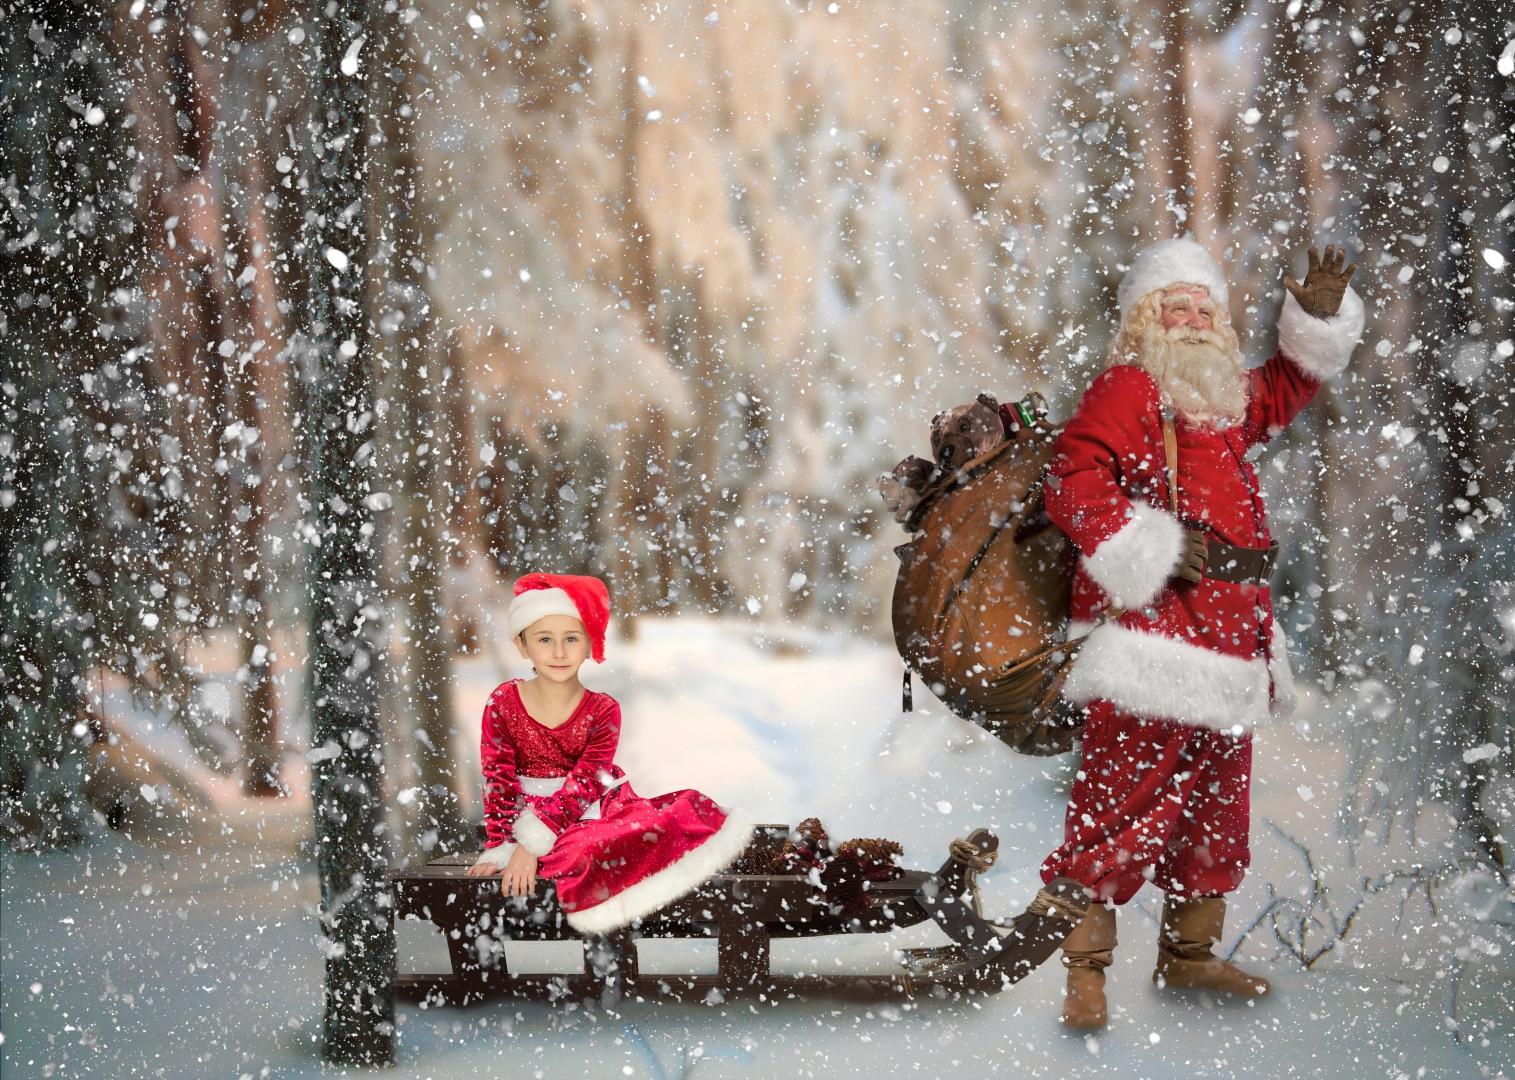 Anna Chmura-Jenkins Santa's sleigh